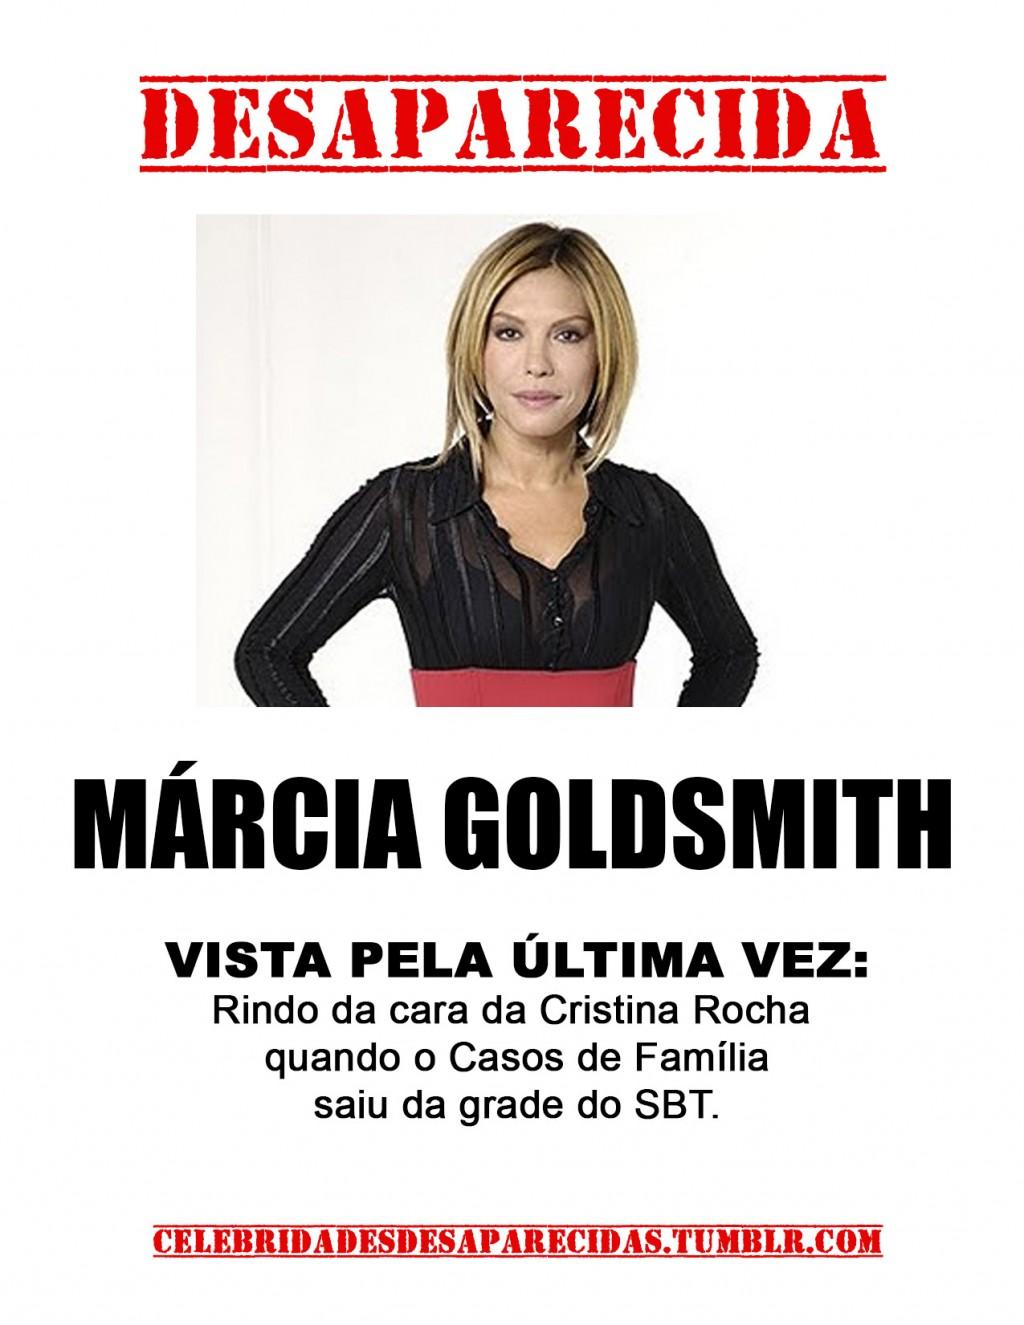 marcia goldsmith